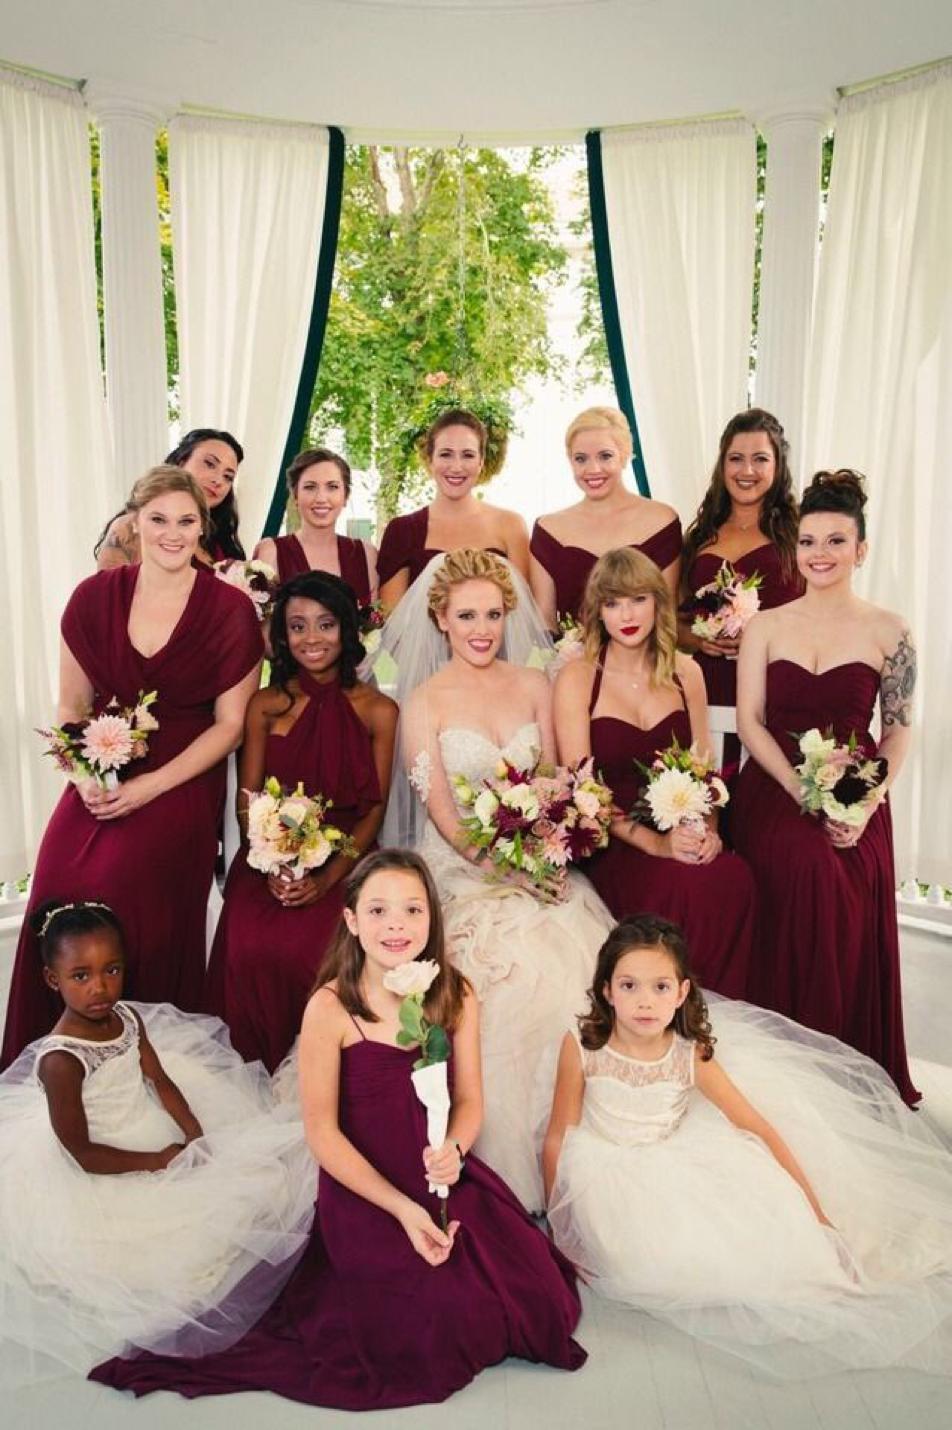 Photos From Abigail Matt S Wedding Taylor Swift Pictures Taylor Alison Swift Taylor Swift 13